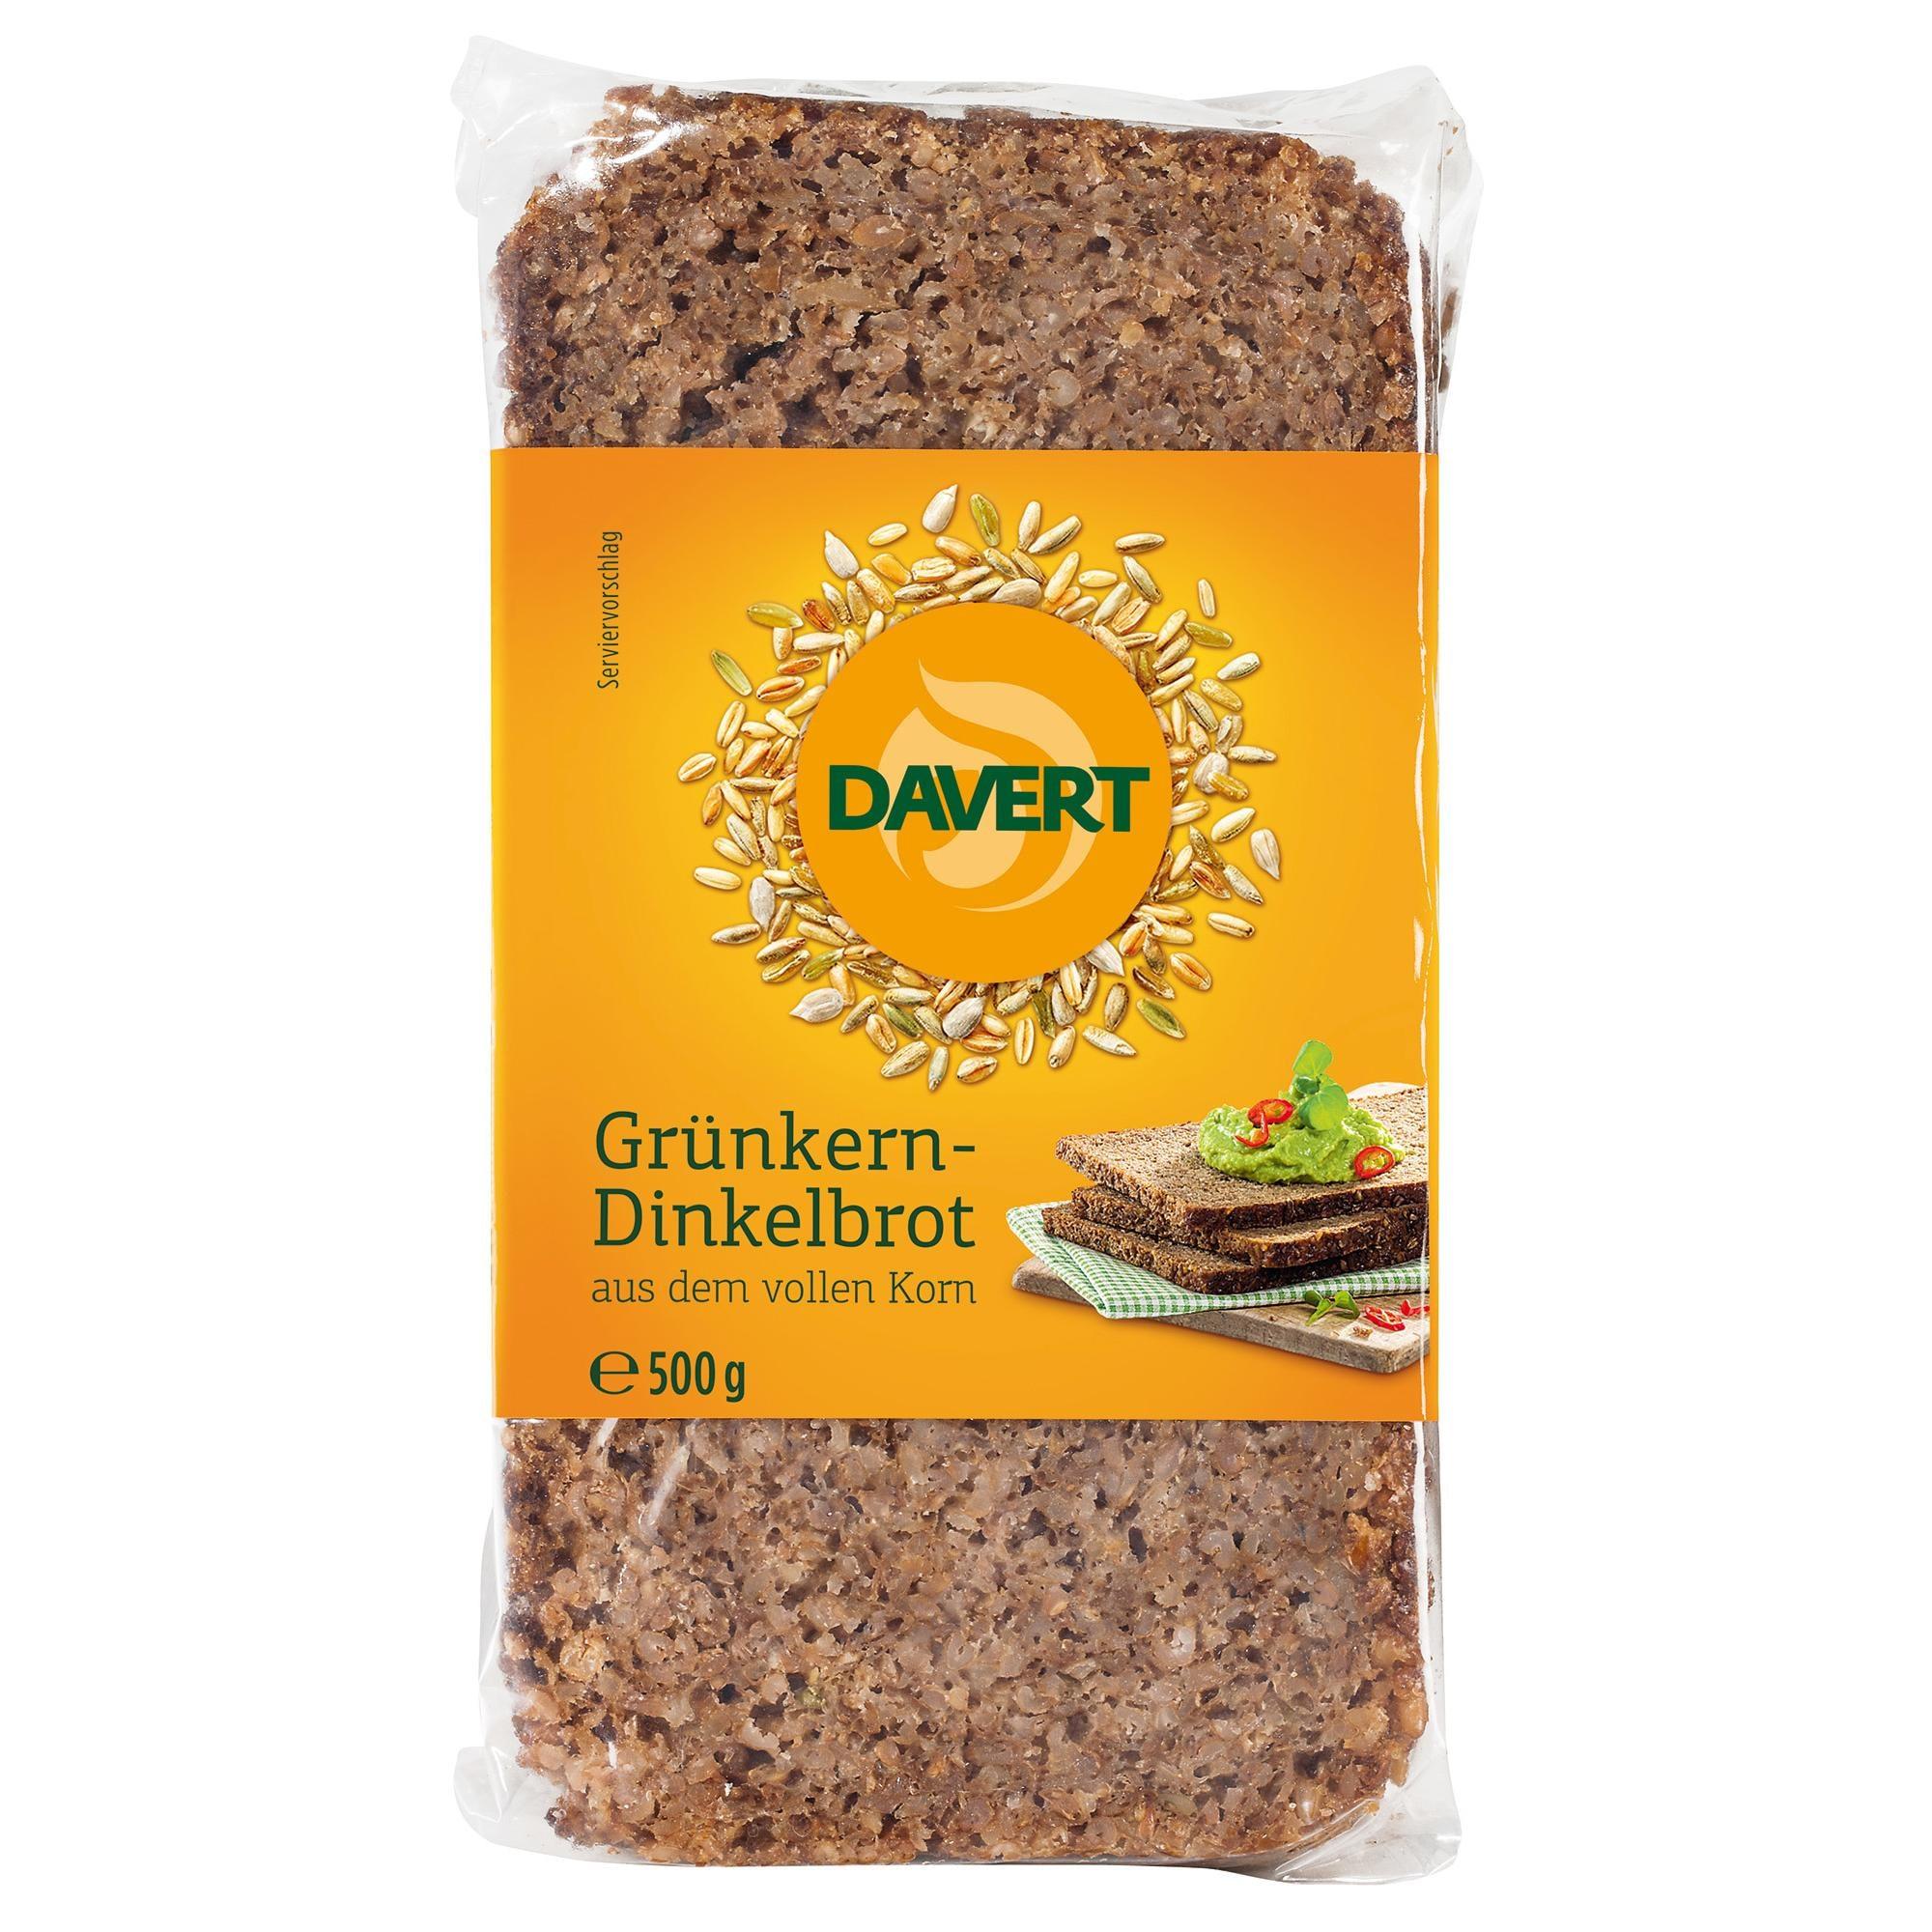 Davert Bio Grünkern-Dinkelbrot aus dem vollen Korn 500g